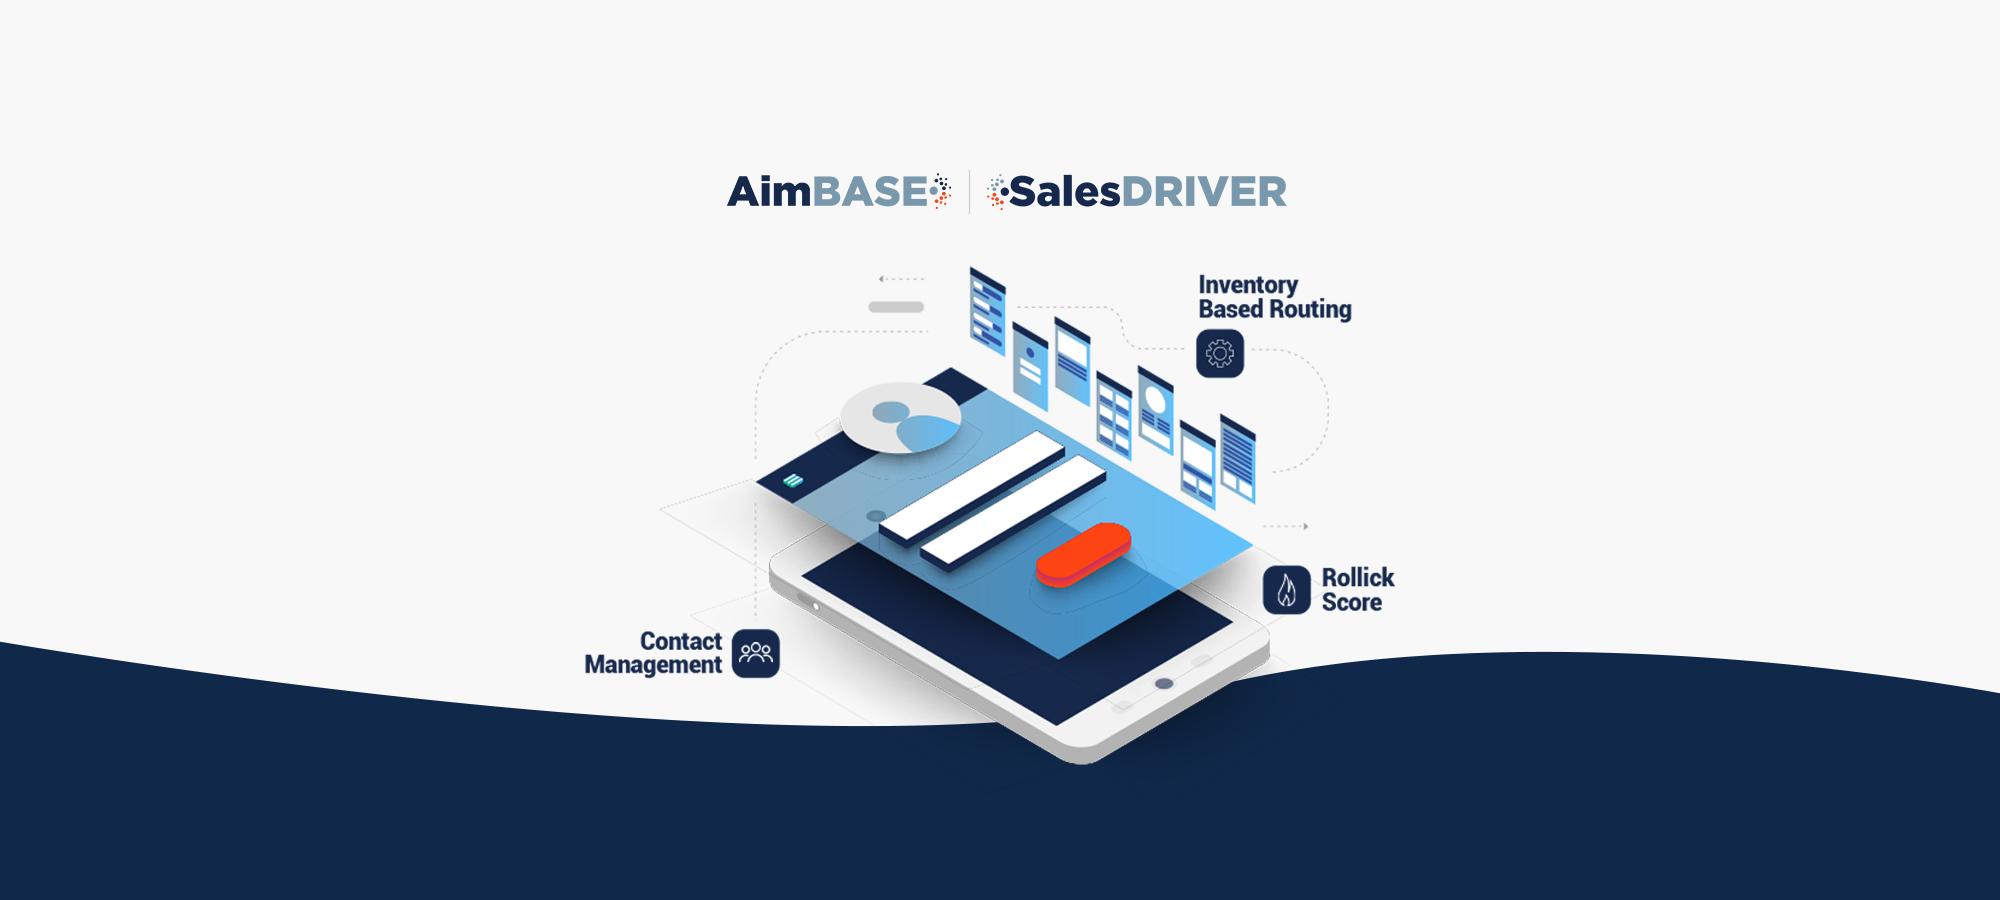 Aimbase Update Q1 2021